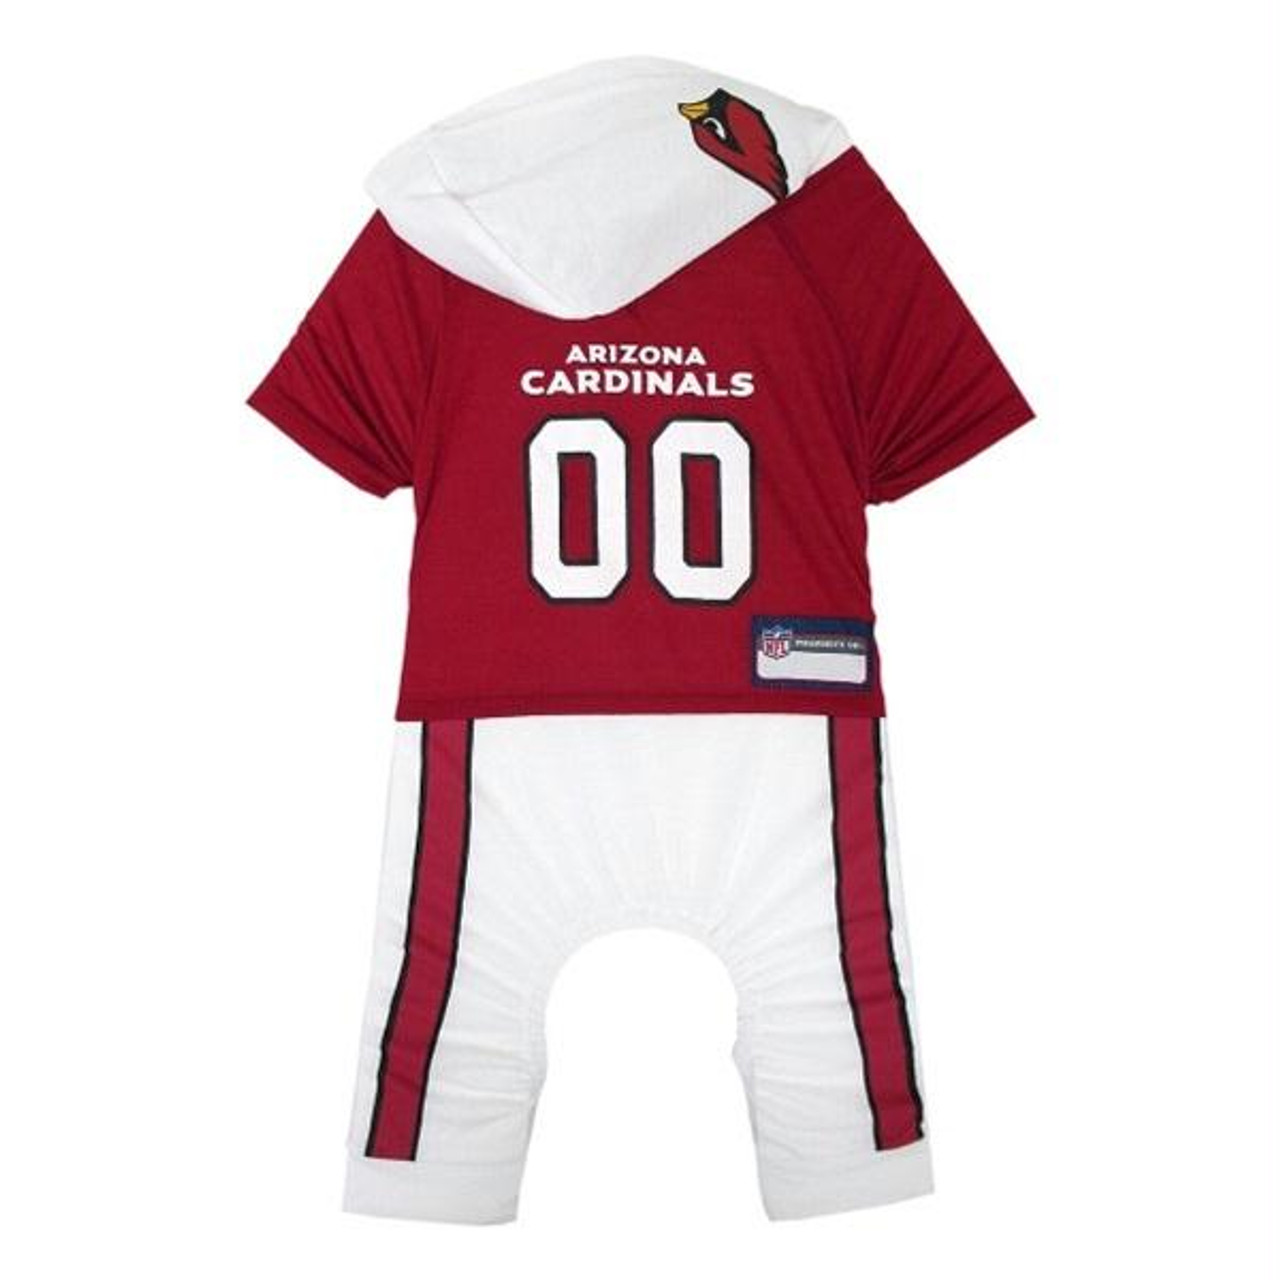 brand new 38ded 6a166 Arizona Cardinals Pet Onesie